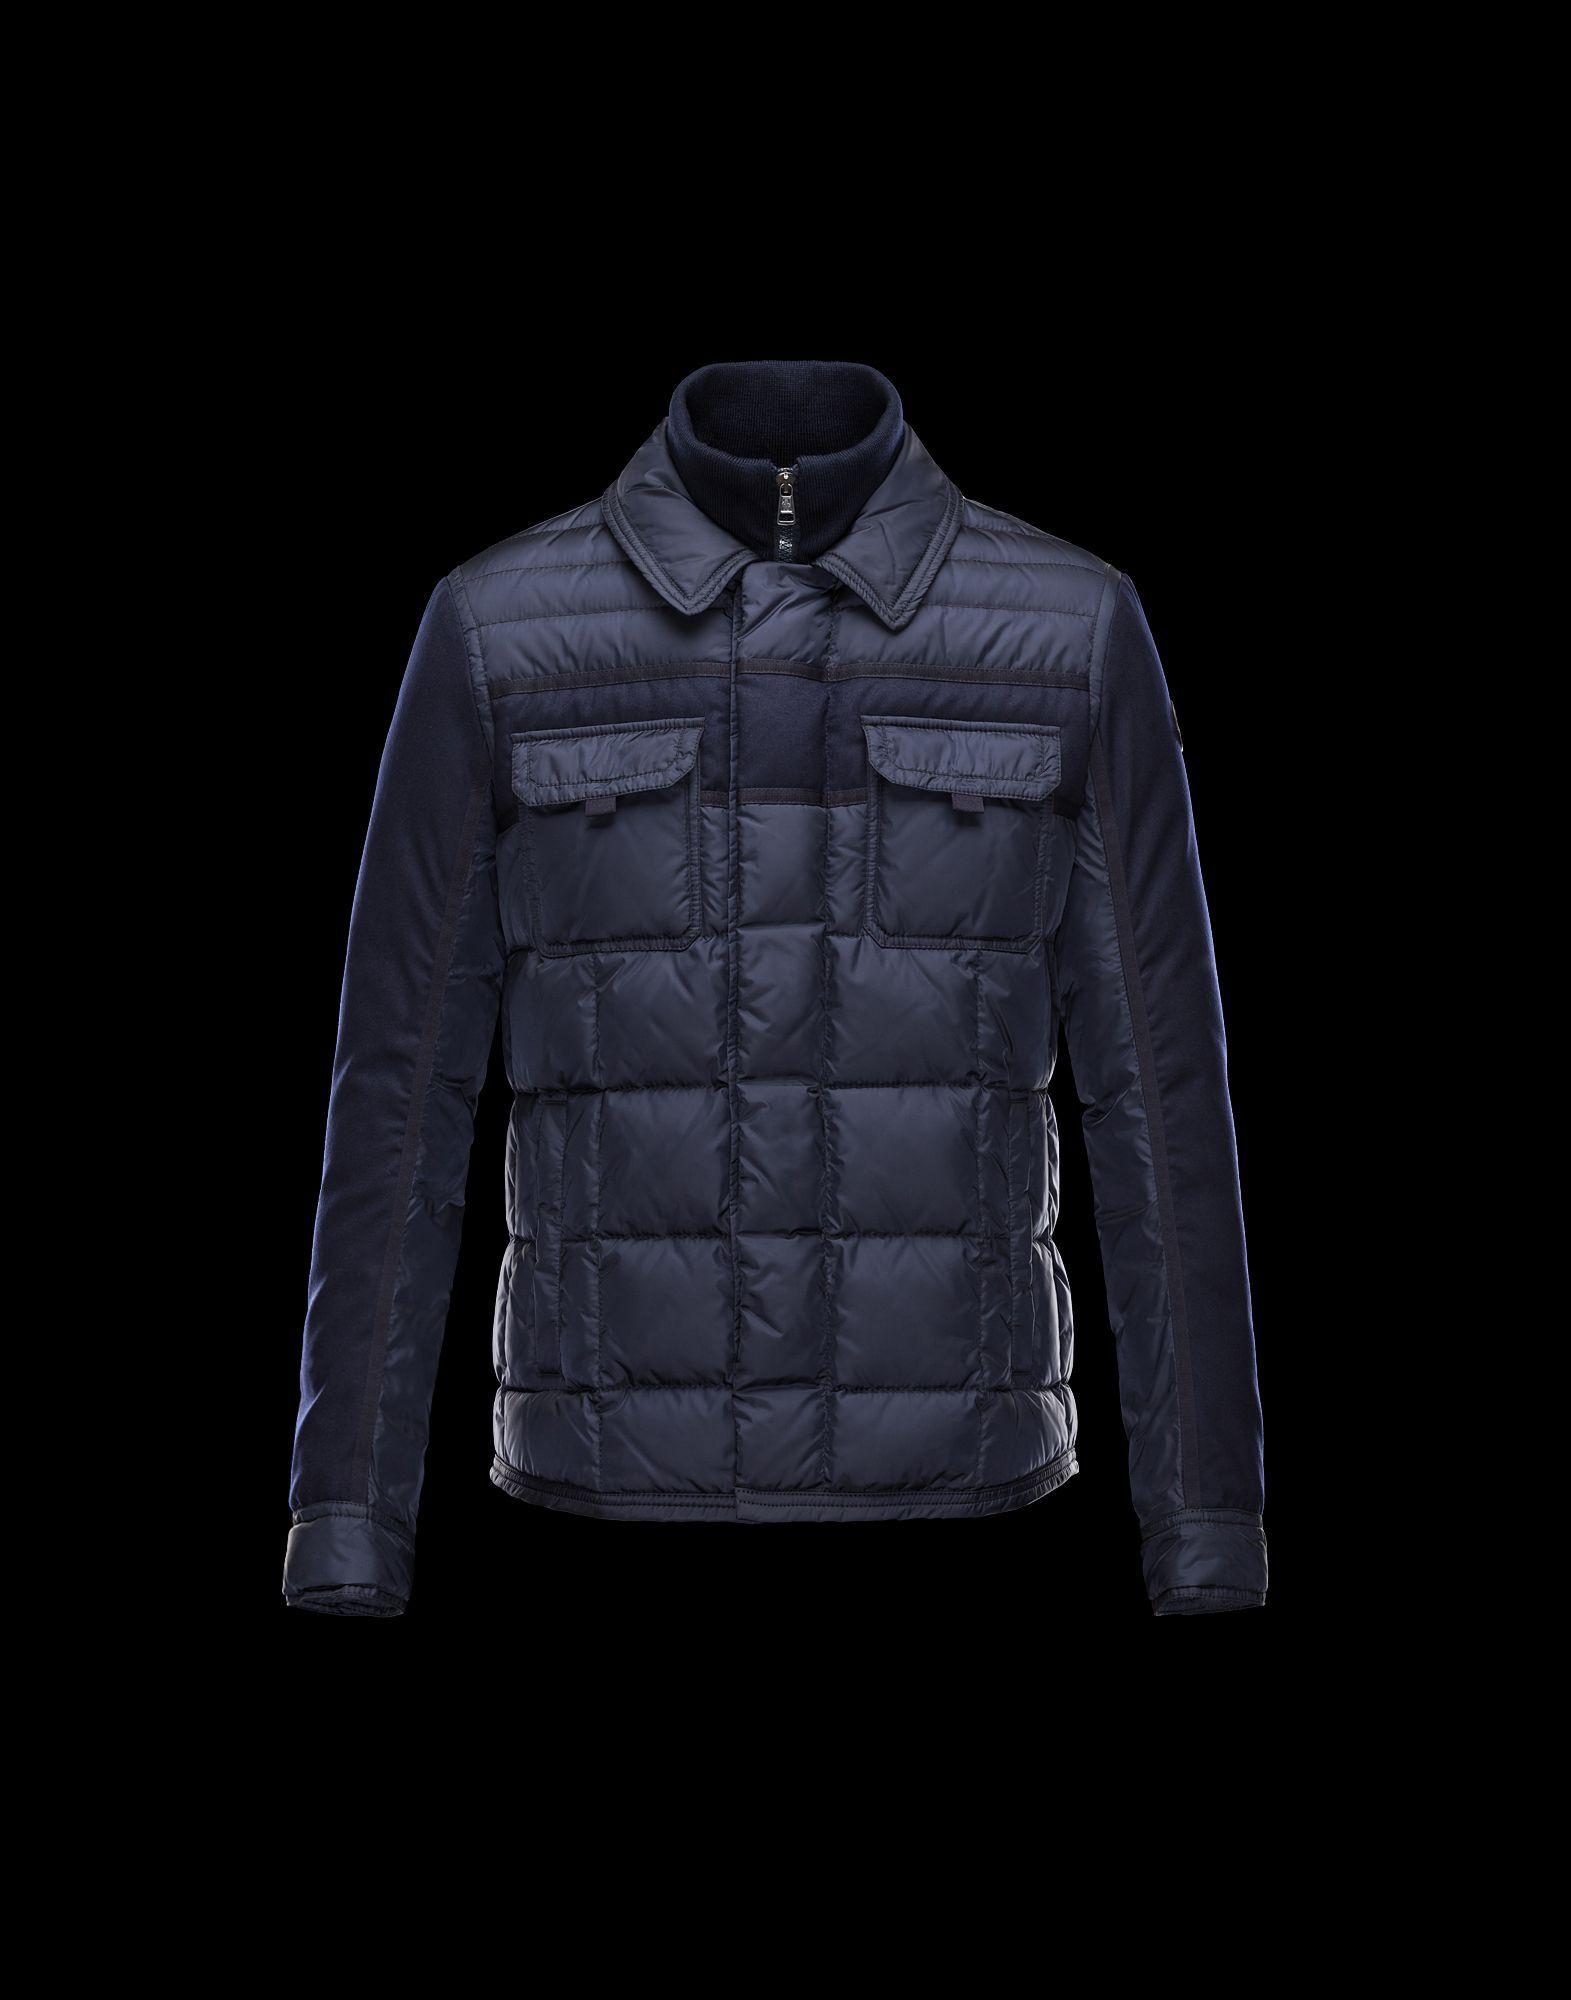 Jacket Men - Outerwear Men on Moncler Online Store   My Style ... 99952248d26